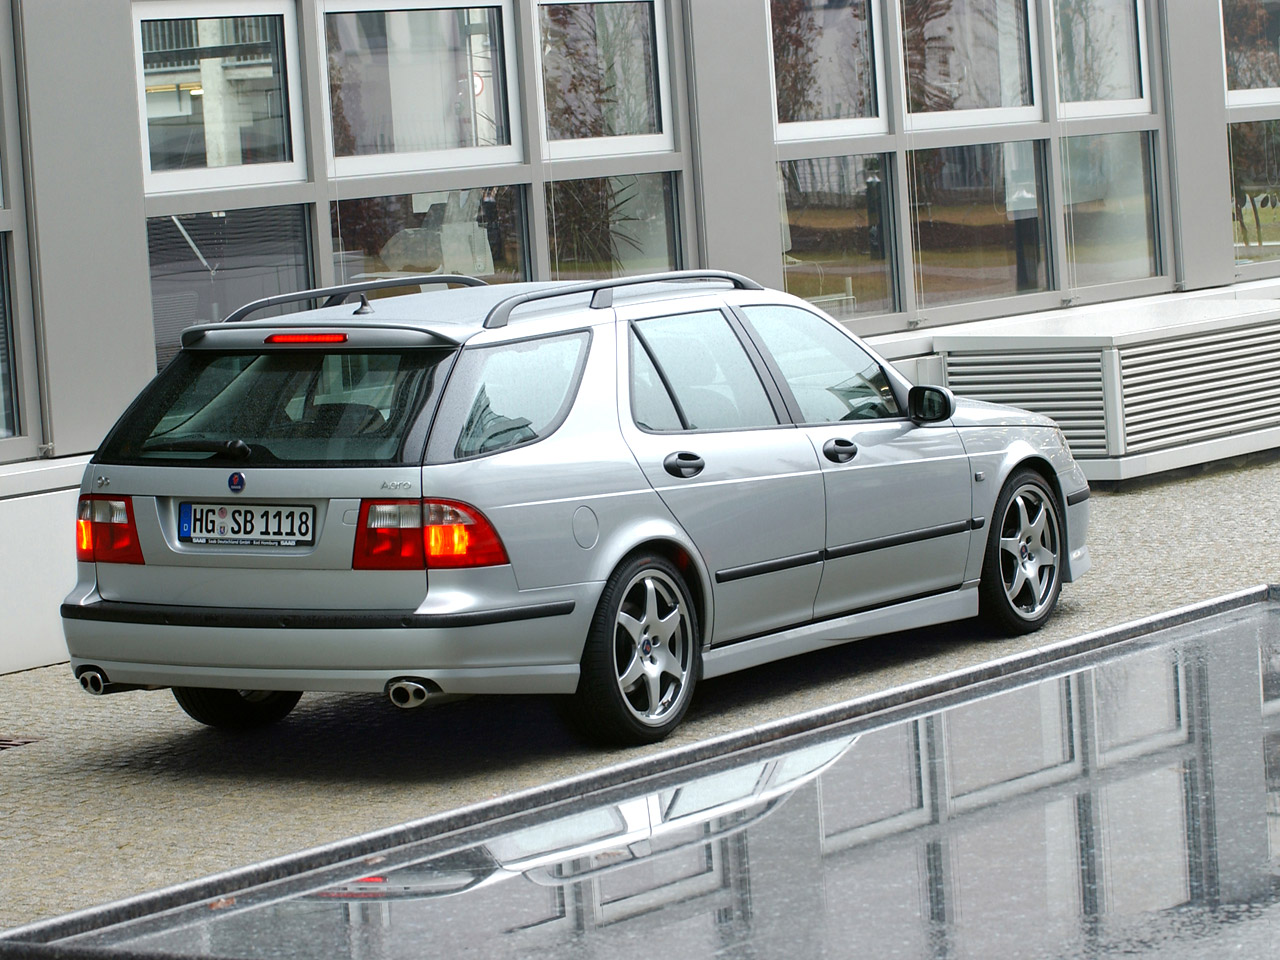 Toyota Of Greenfield >> Hirsch Performance Saab 9-5 Wagon Aero photos - PhotoGallery with 2 pics| CarsBase.com